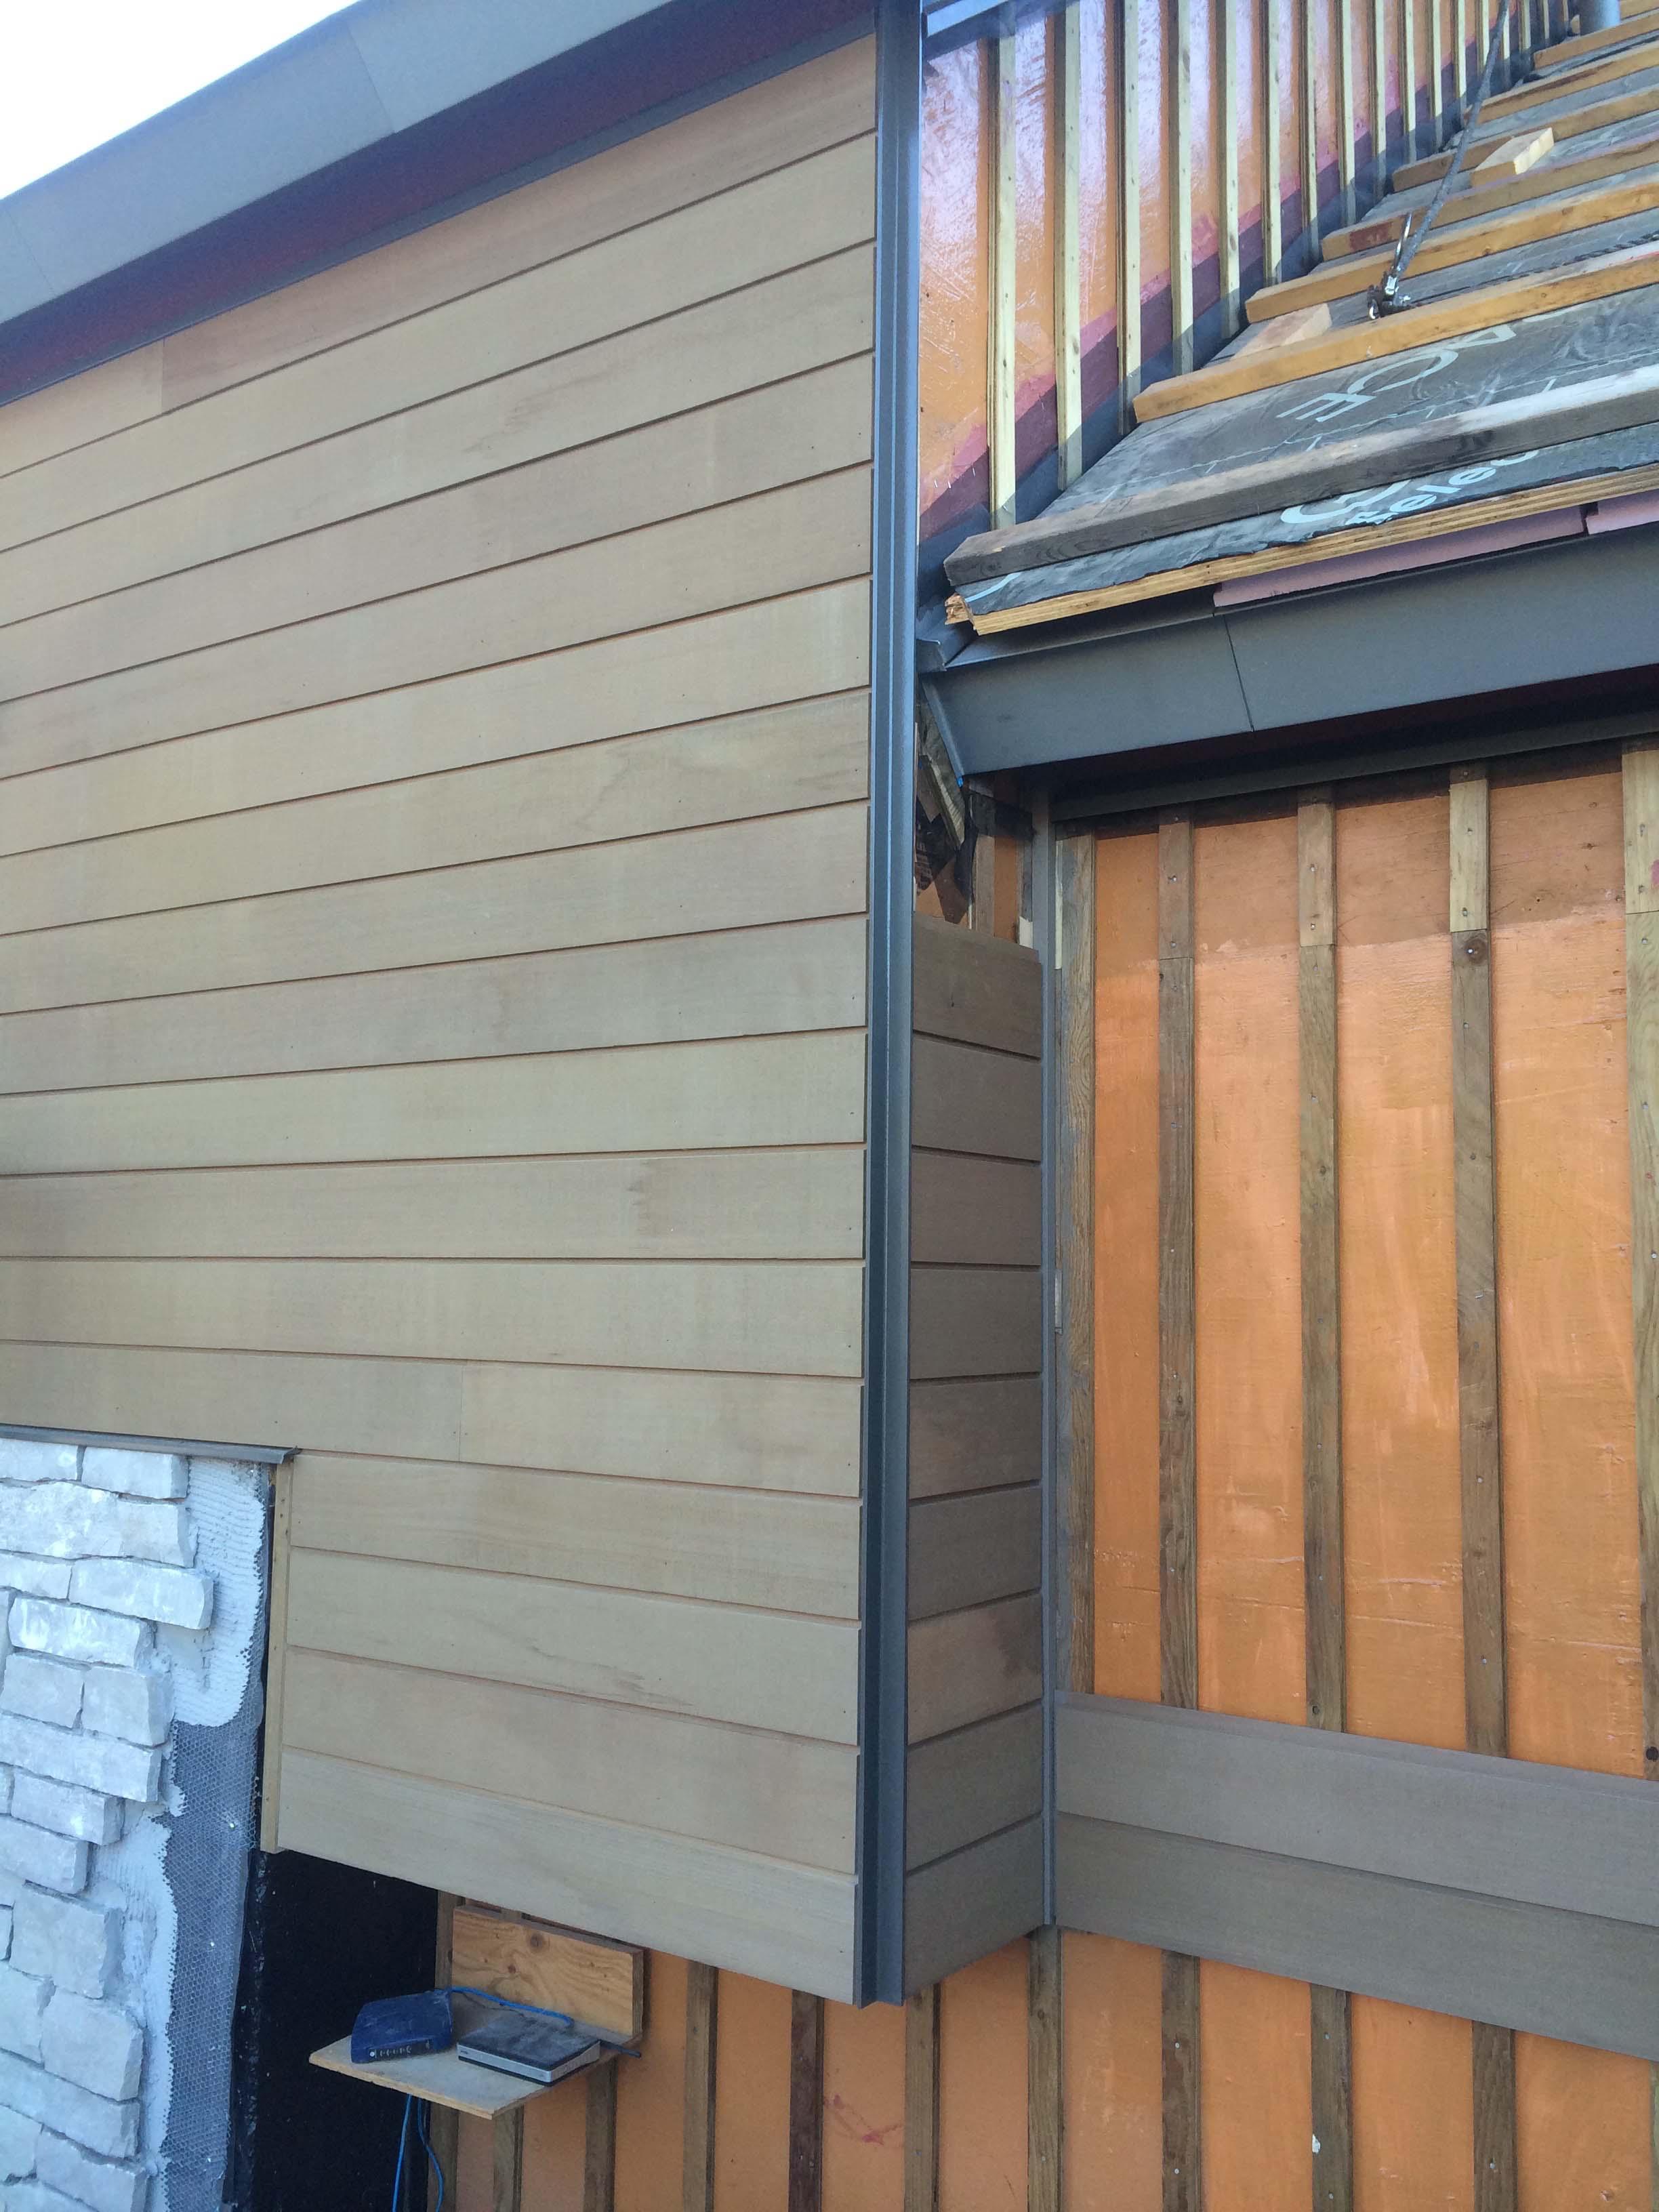 Postle_Construction_ExteriorCladding12.jpg